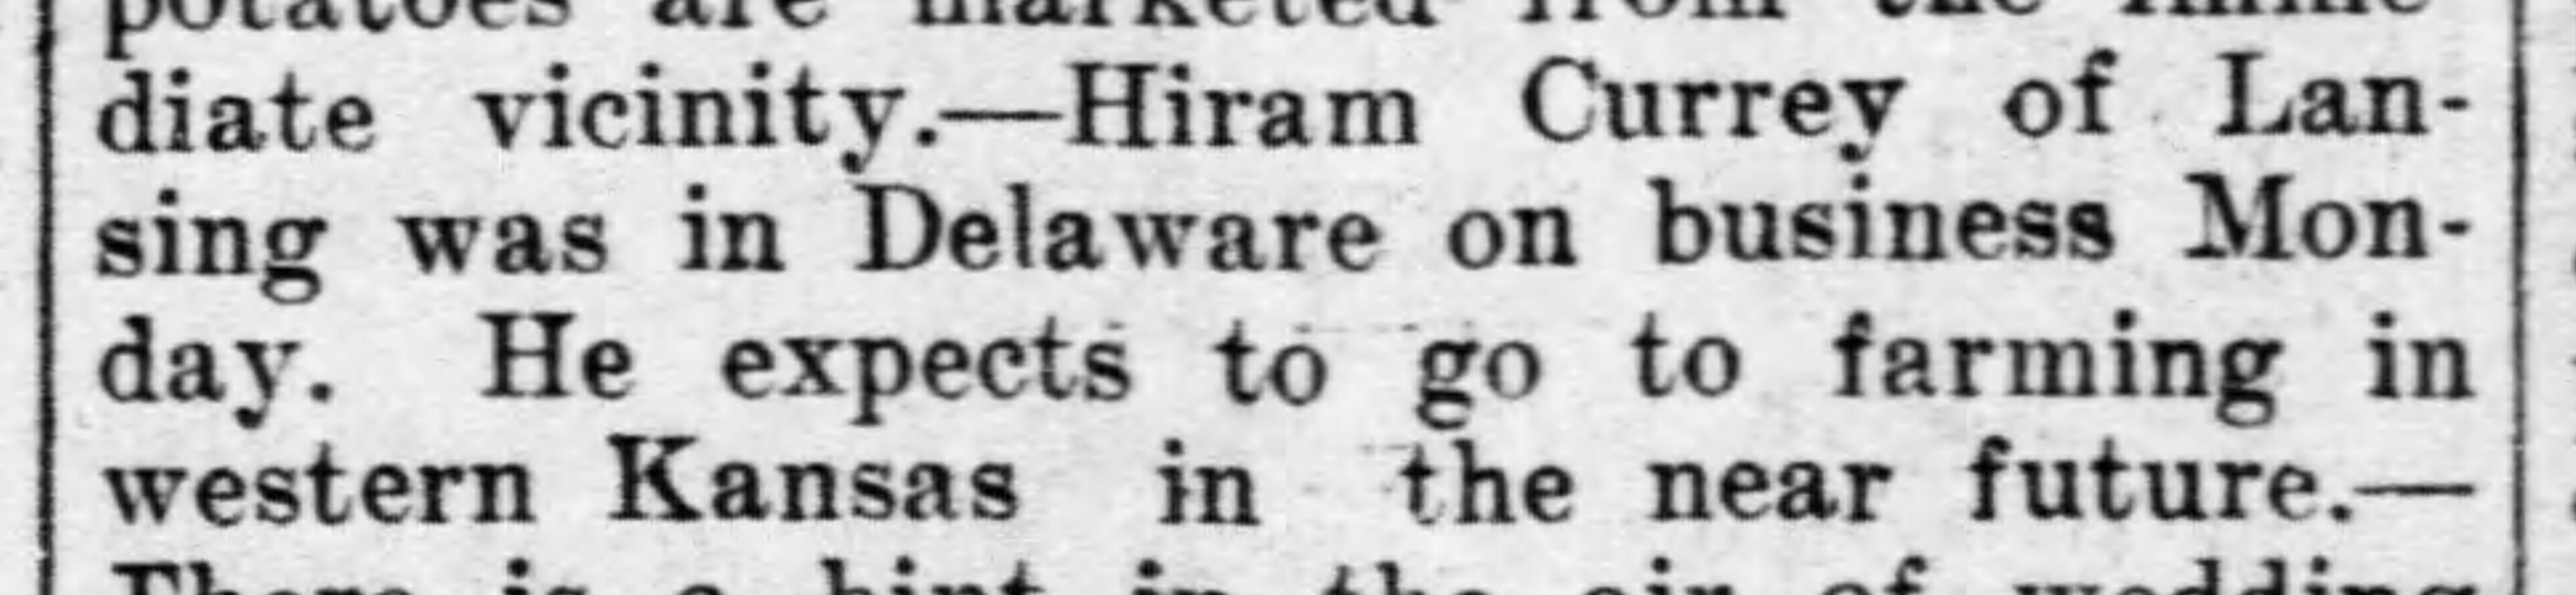 currey-hiram-b1866-1908-the_leavenworth_times_fri__jul_17__1908_.jpg